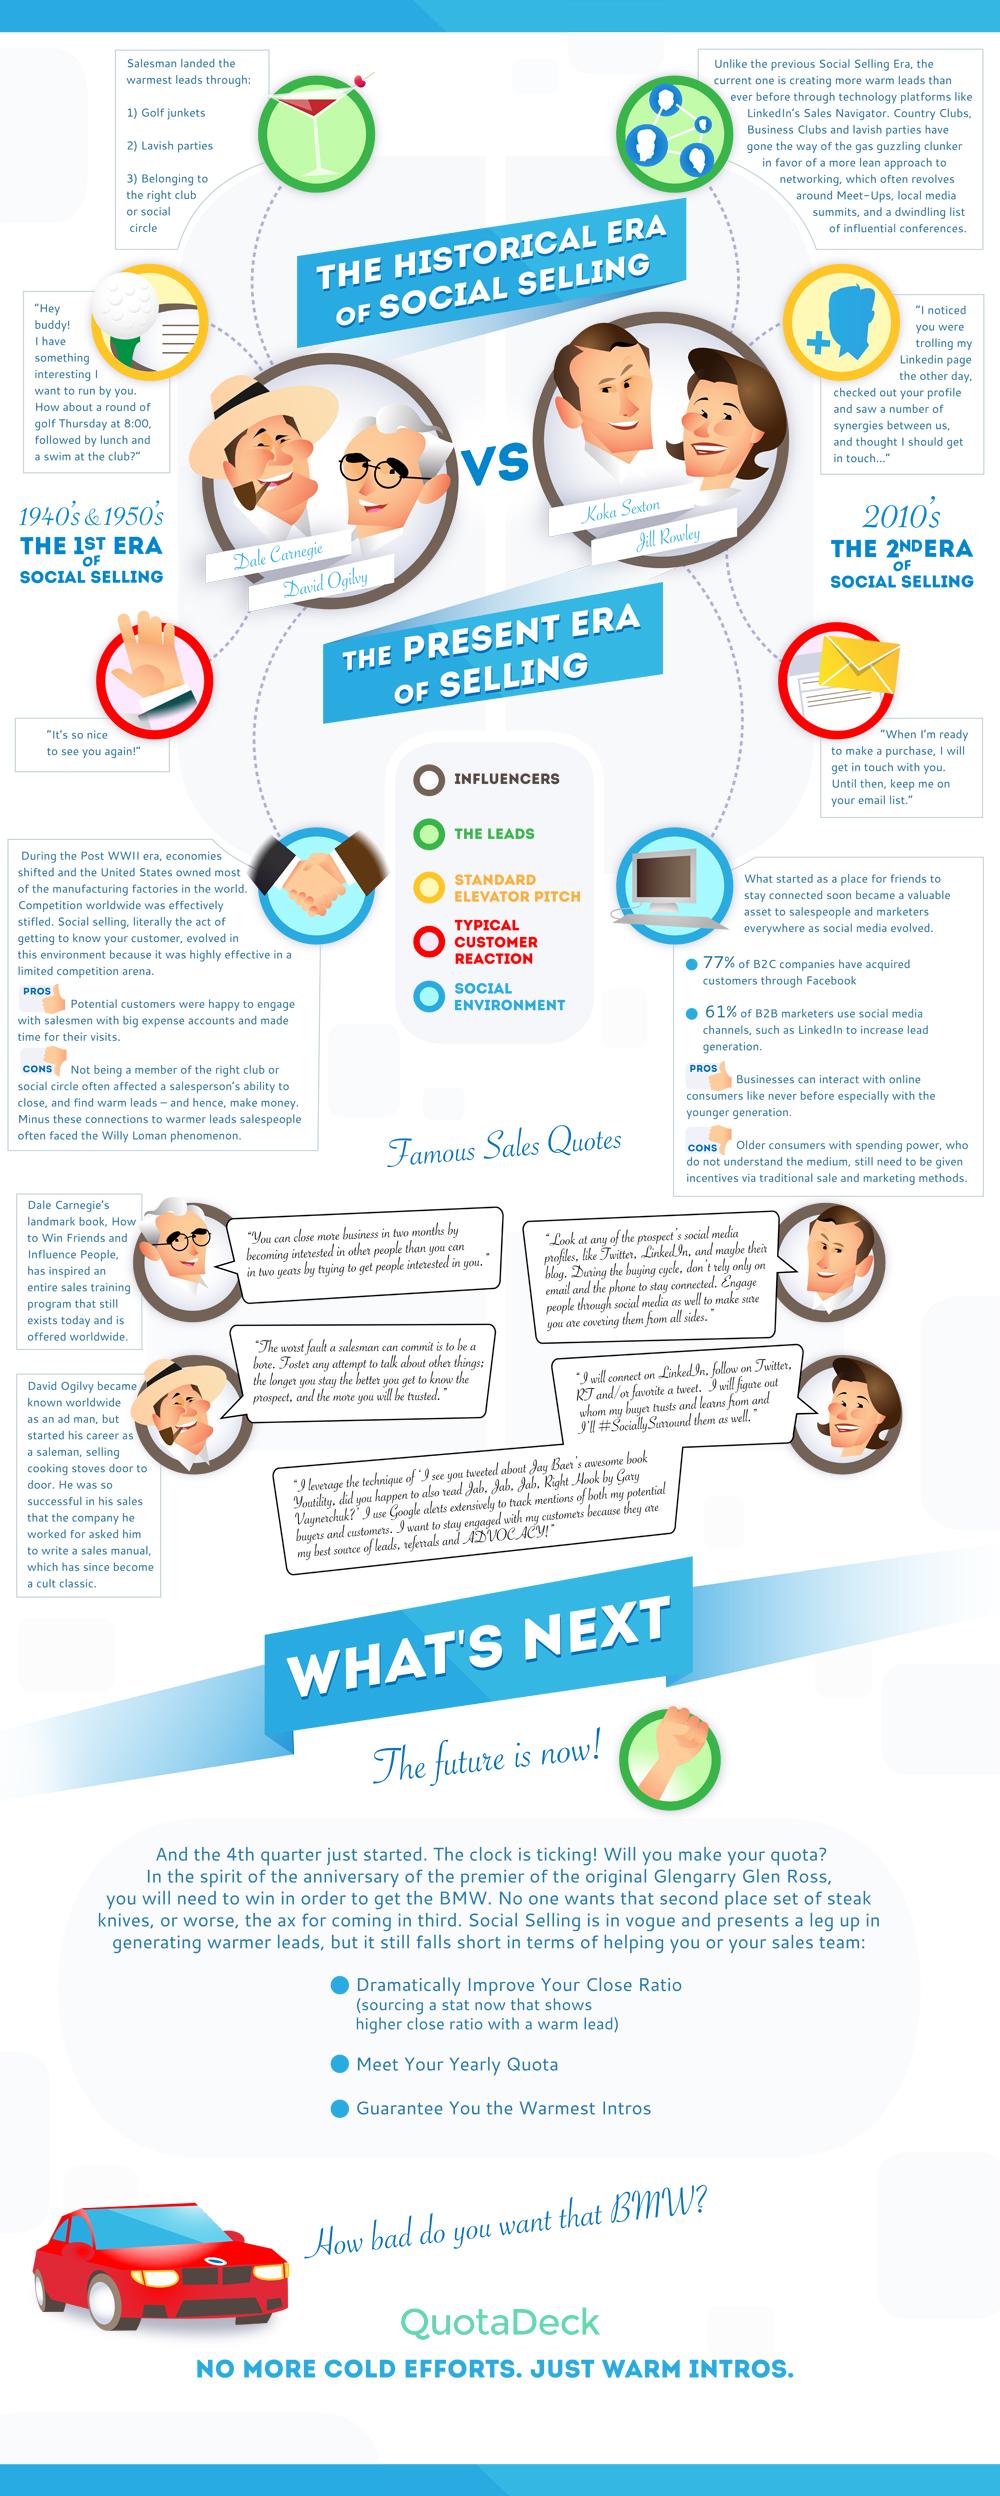 koka sexton social selling infographic